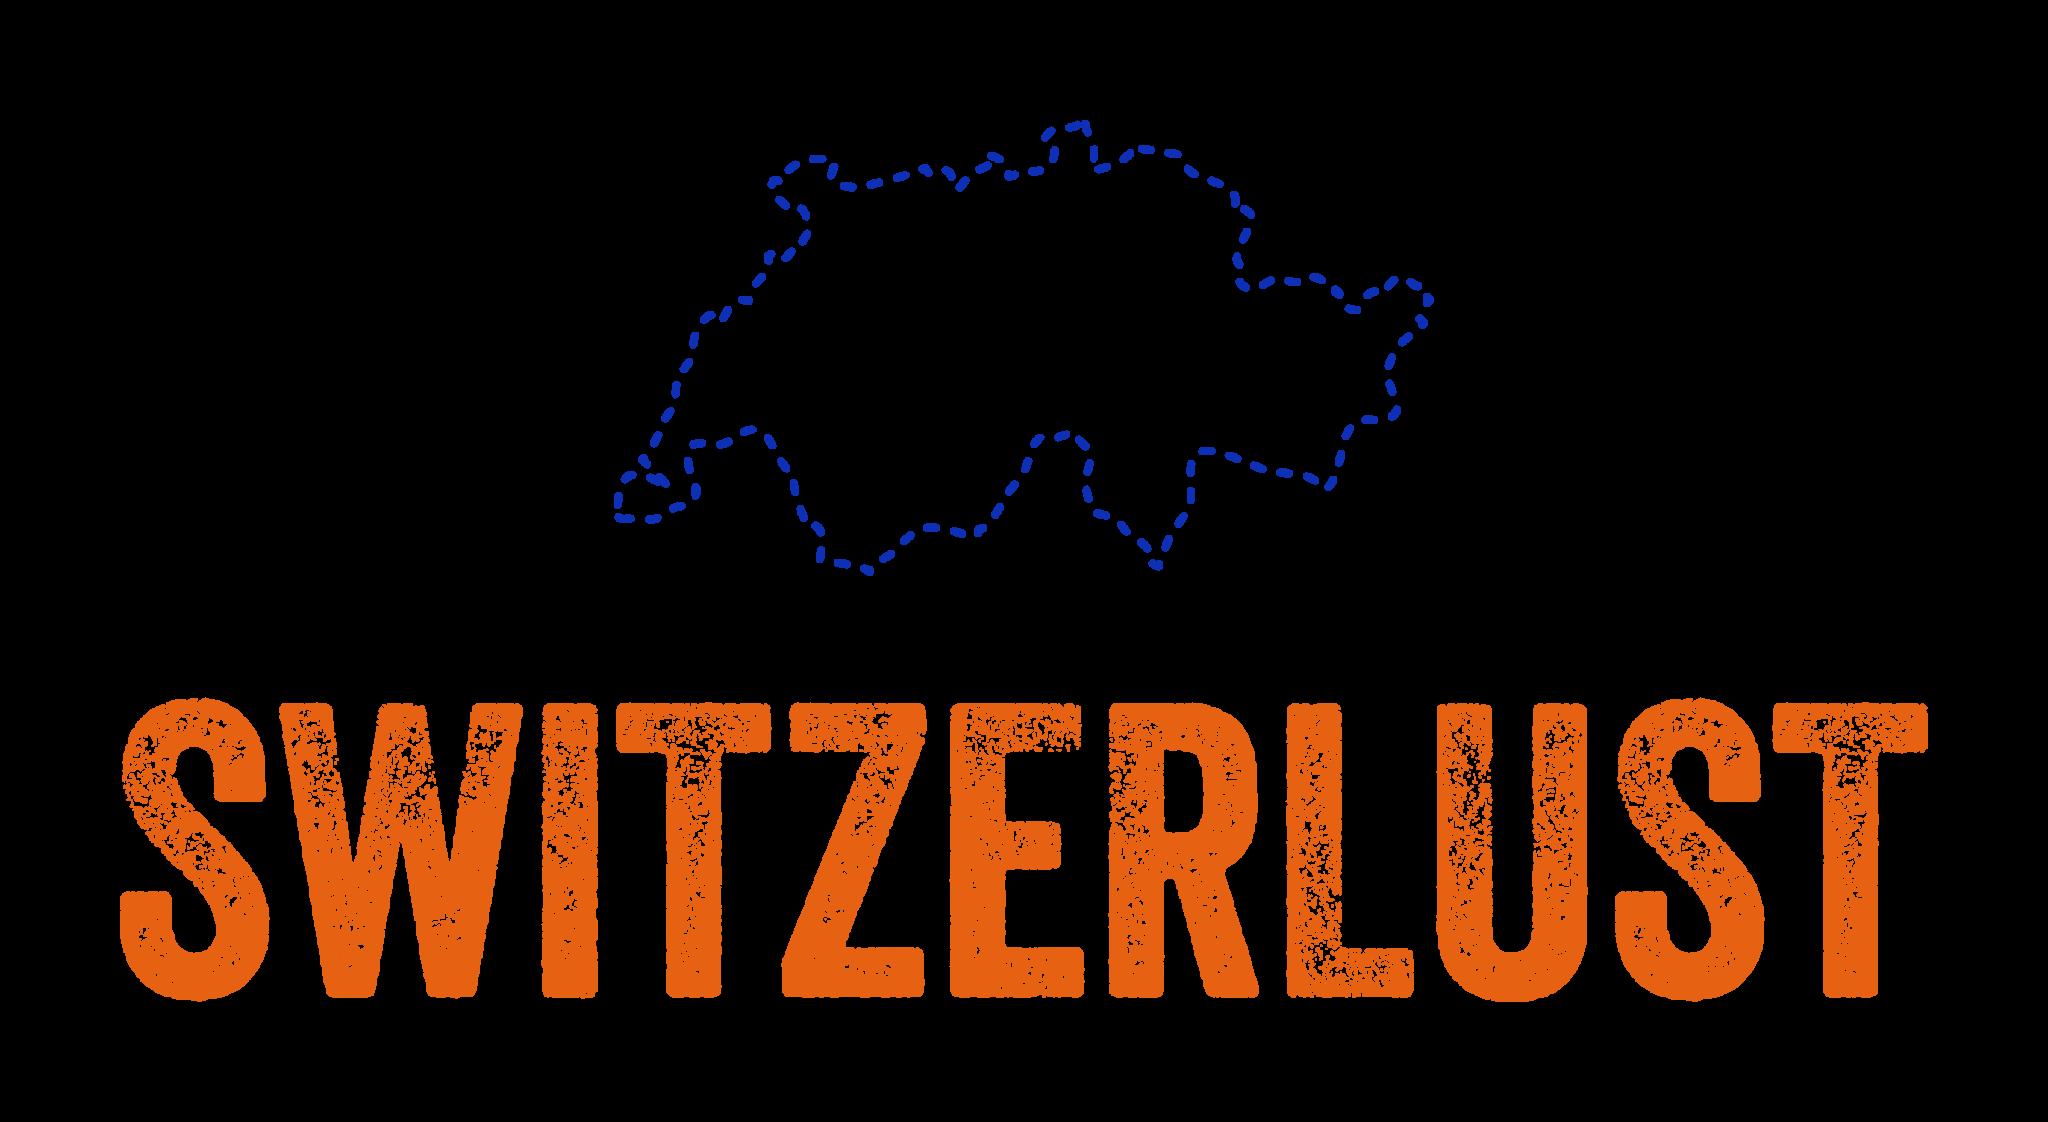 Switzerlust